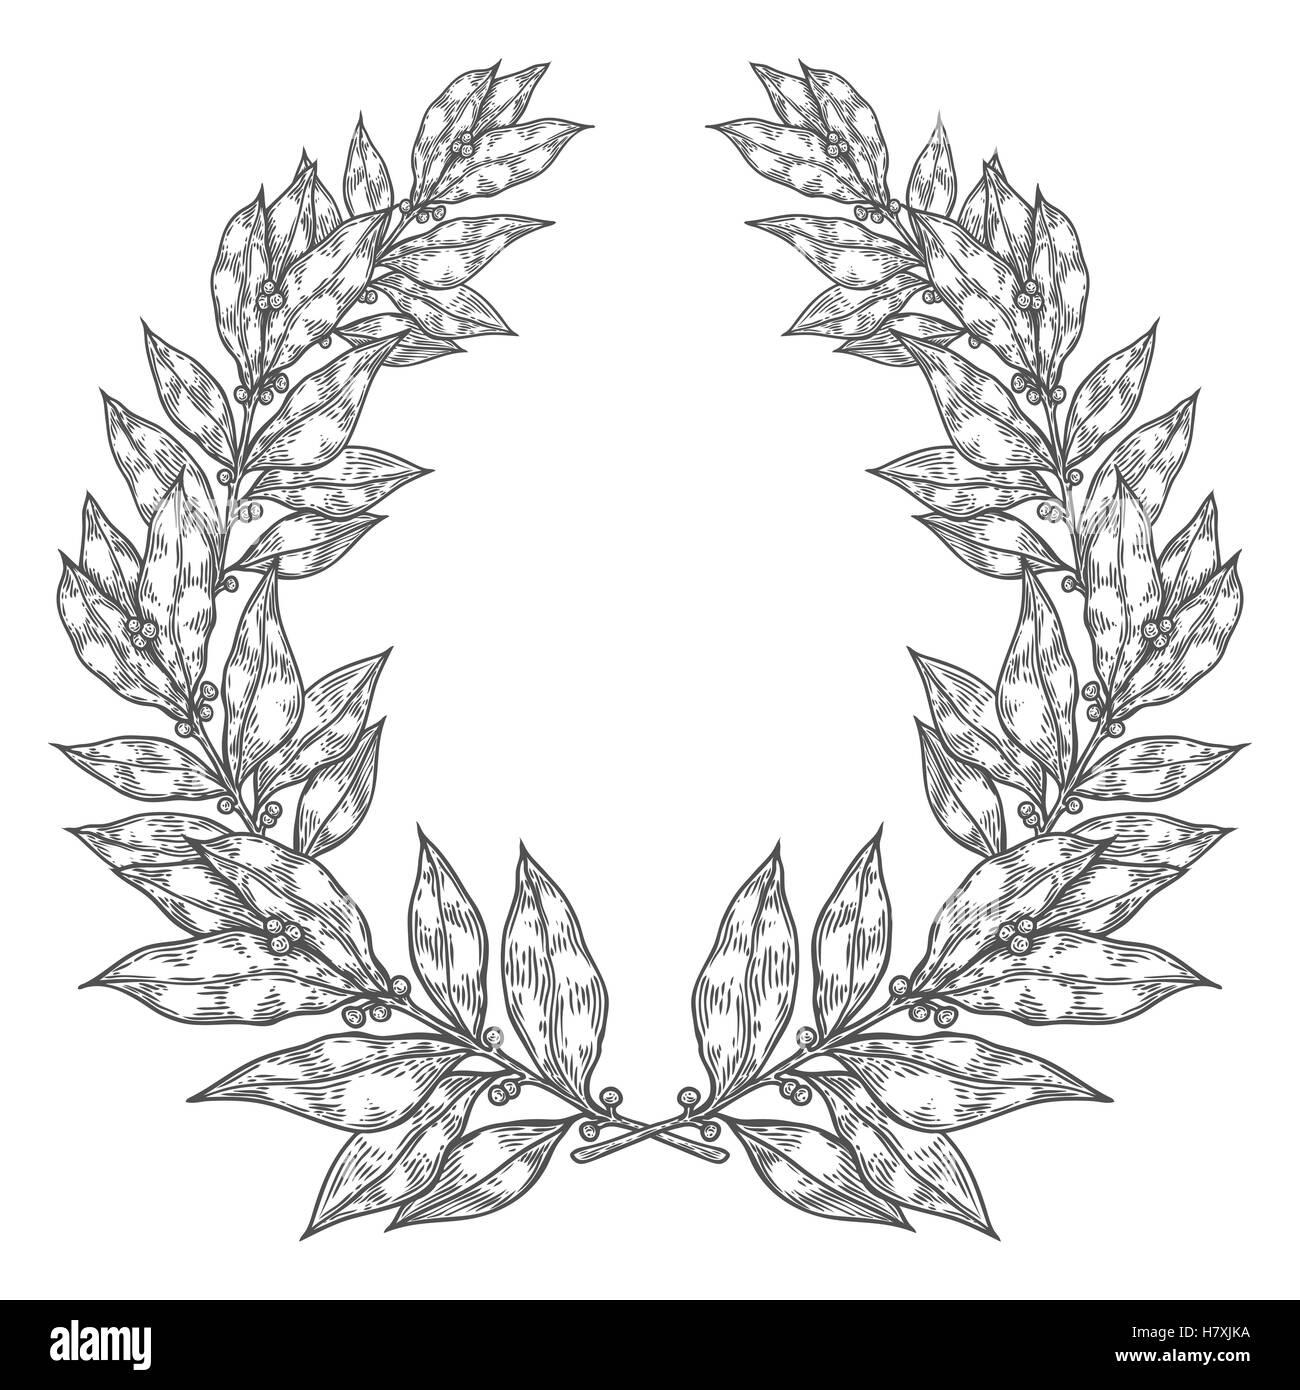 Uncategorized Drawn Leaf laurel bay white black leaf hand drawn vector illustration vintage decorative wreath sketch design elements perfect fo